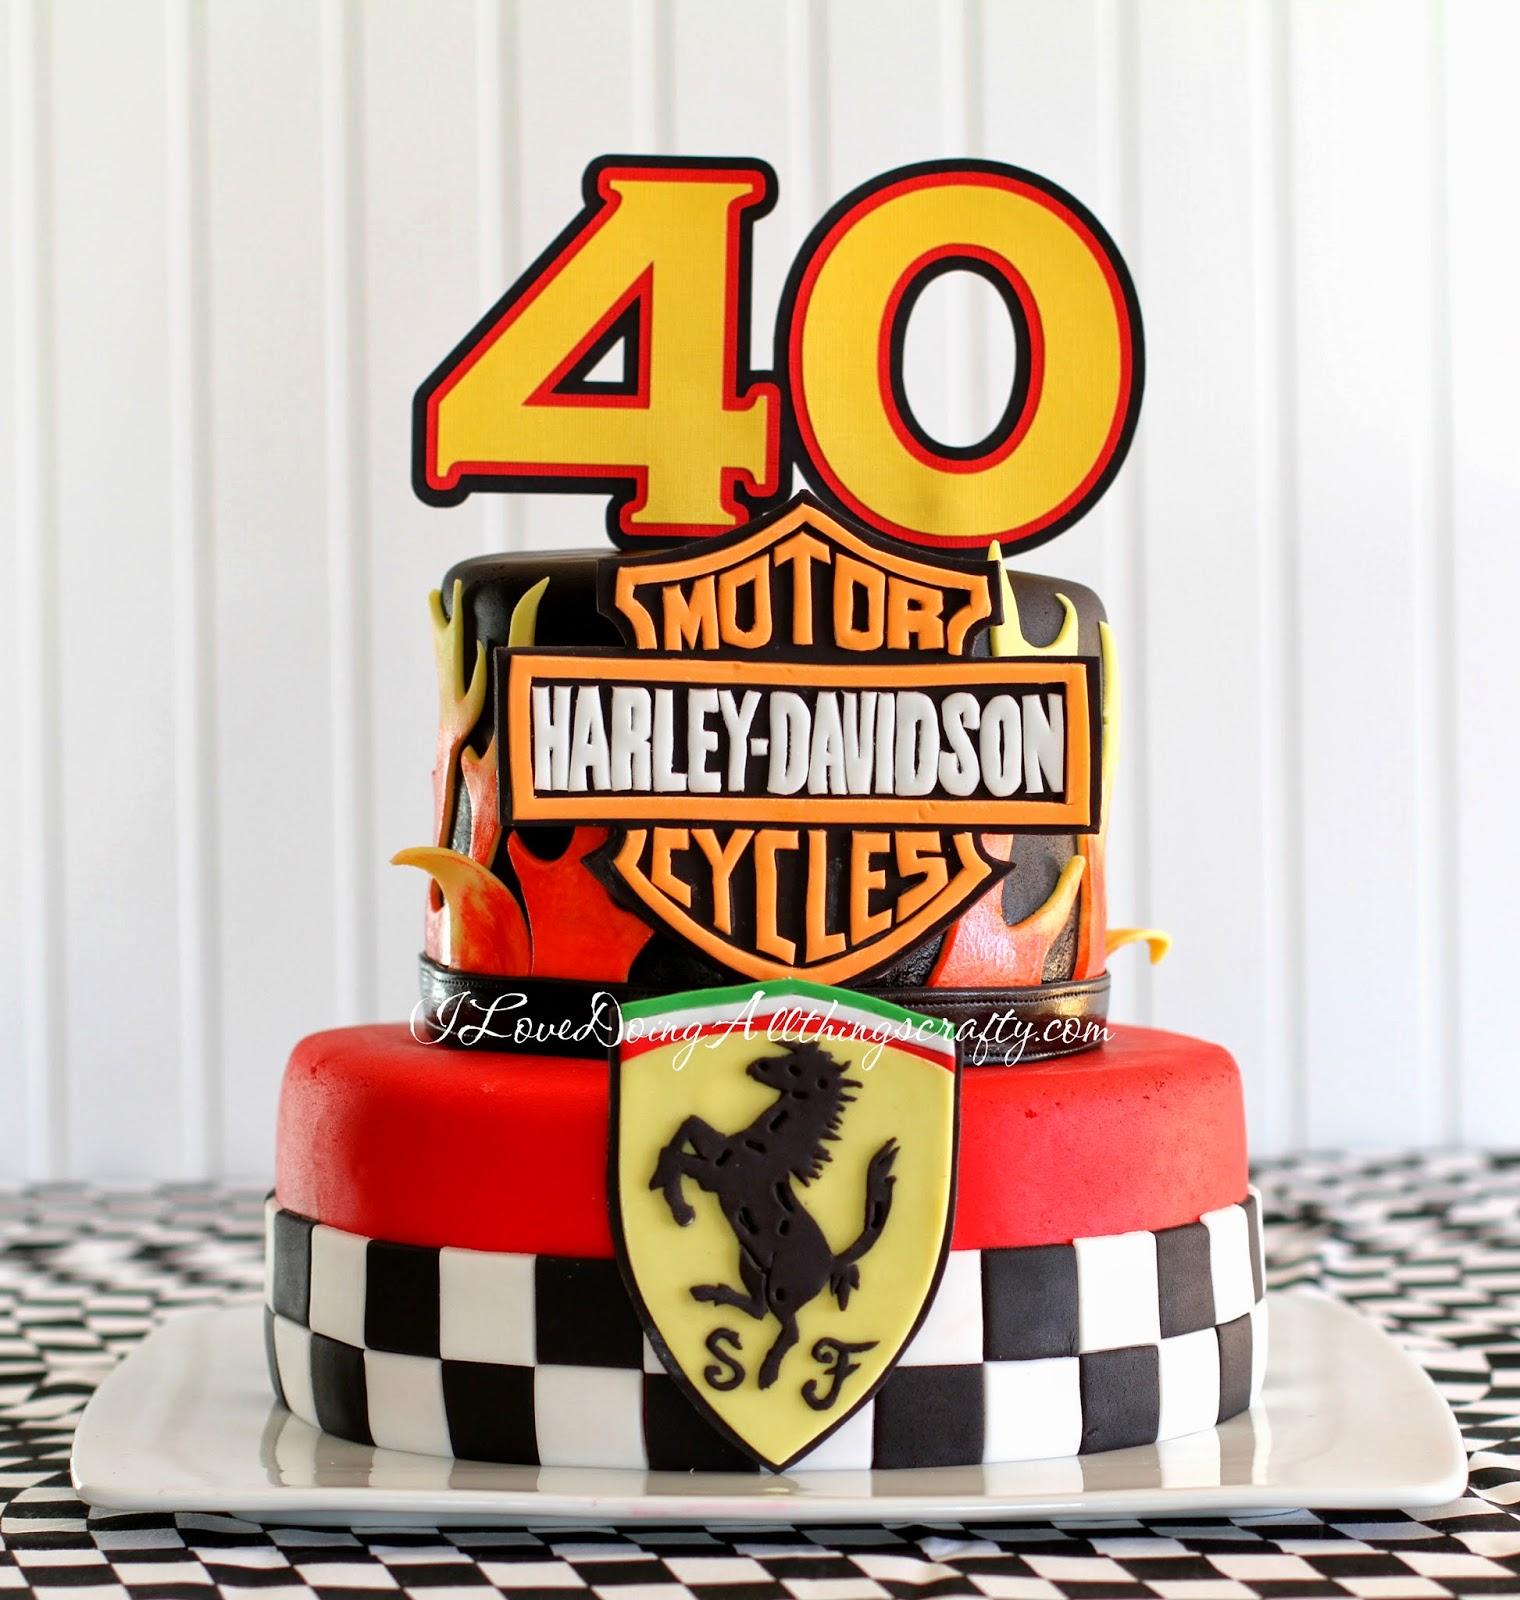 Harley Davidson Ferrari 40th Birthday Cake